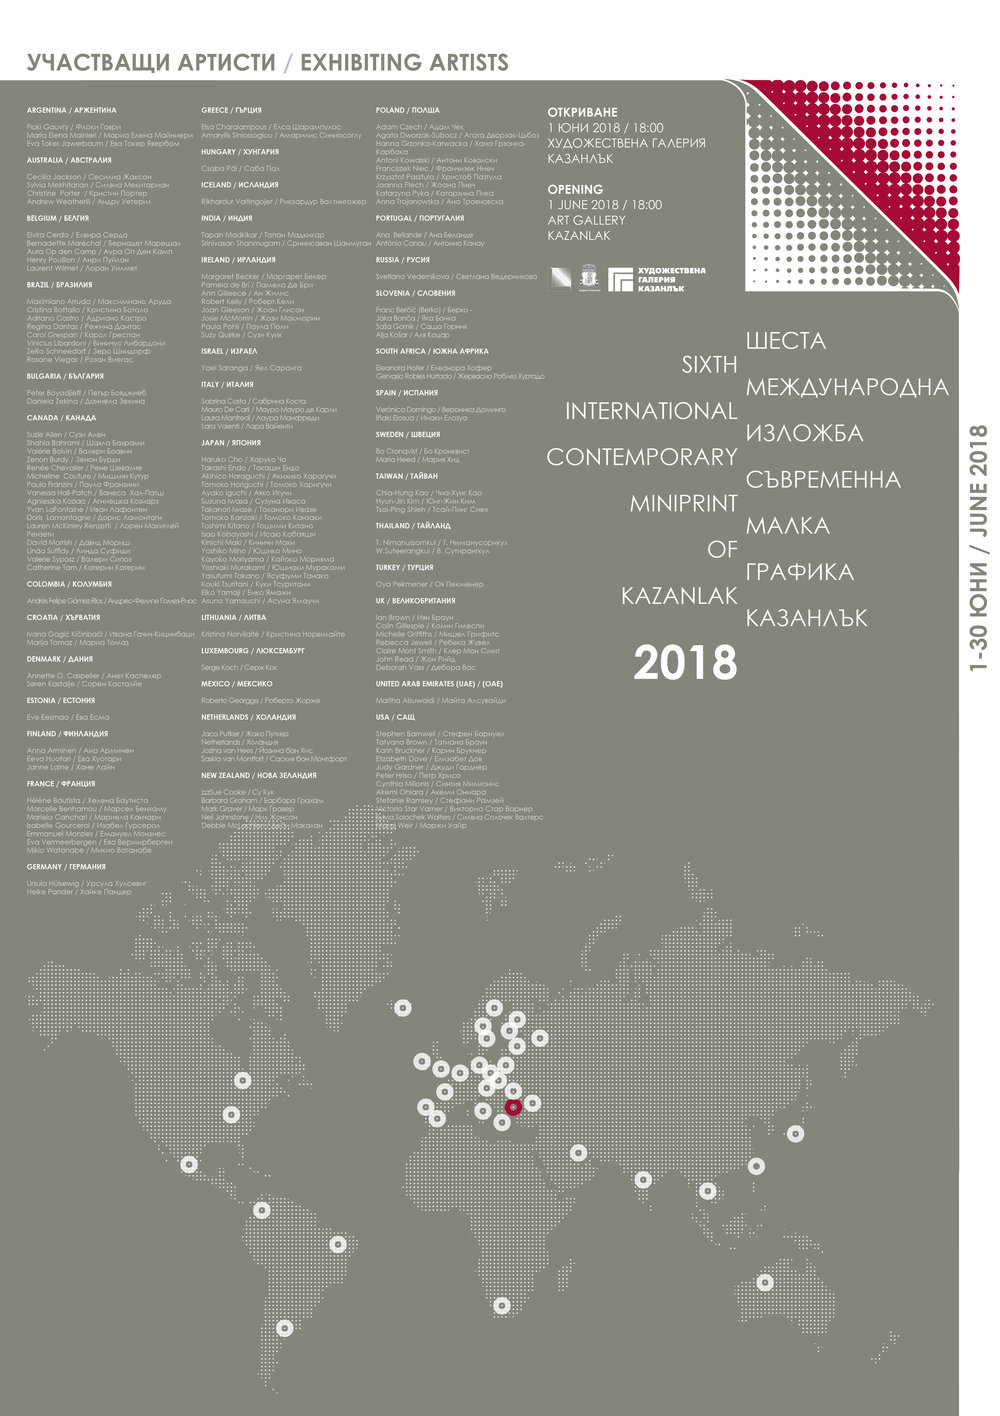 2018 Exhibiting Artists